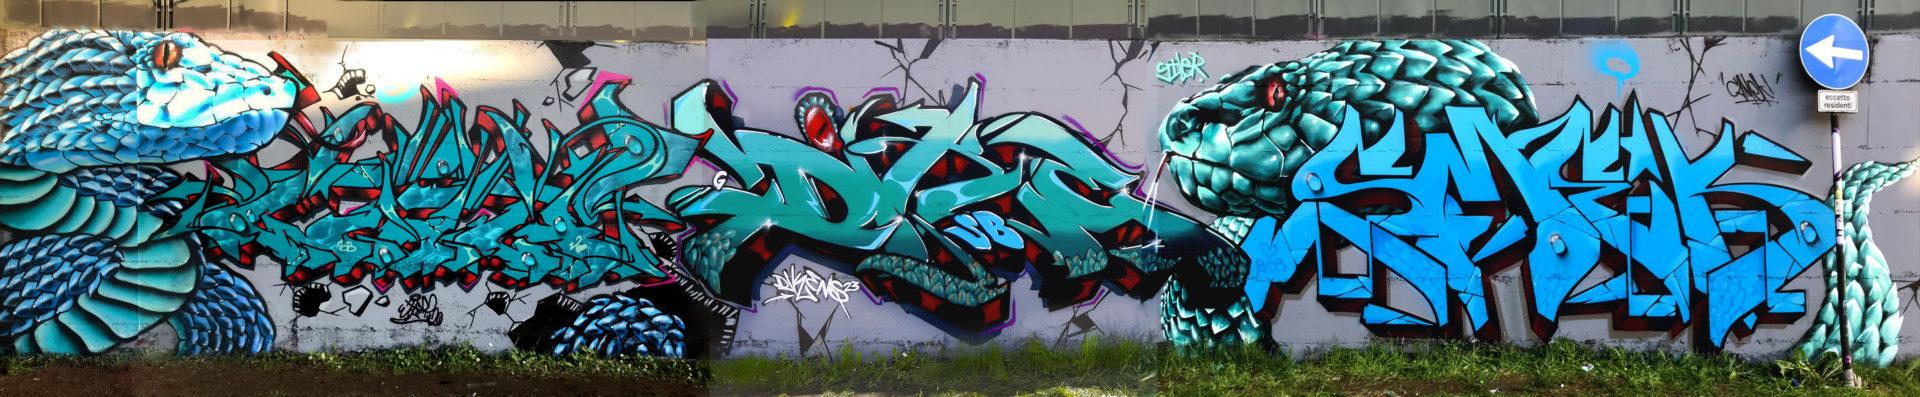 Siret + Wolf2 + Dikens23 + Siler + Smek